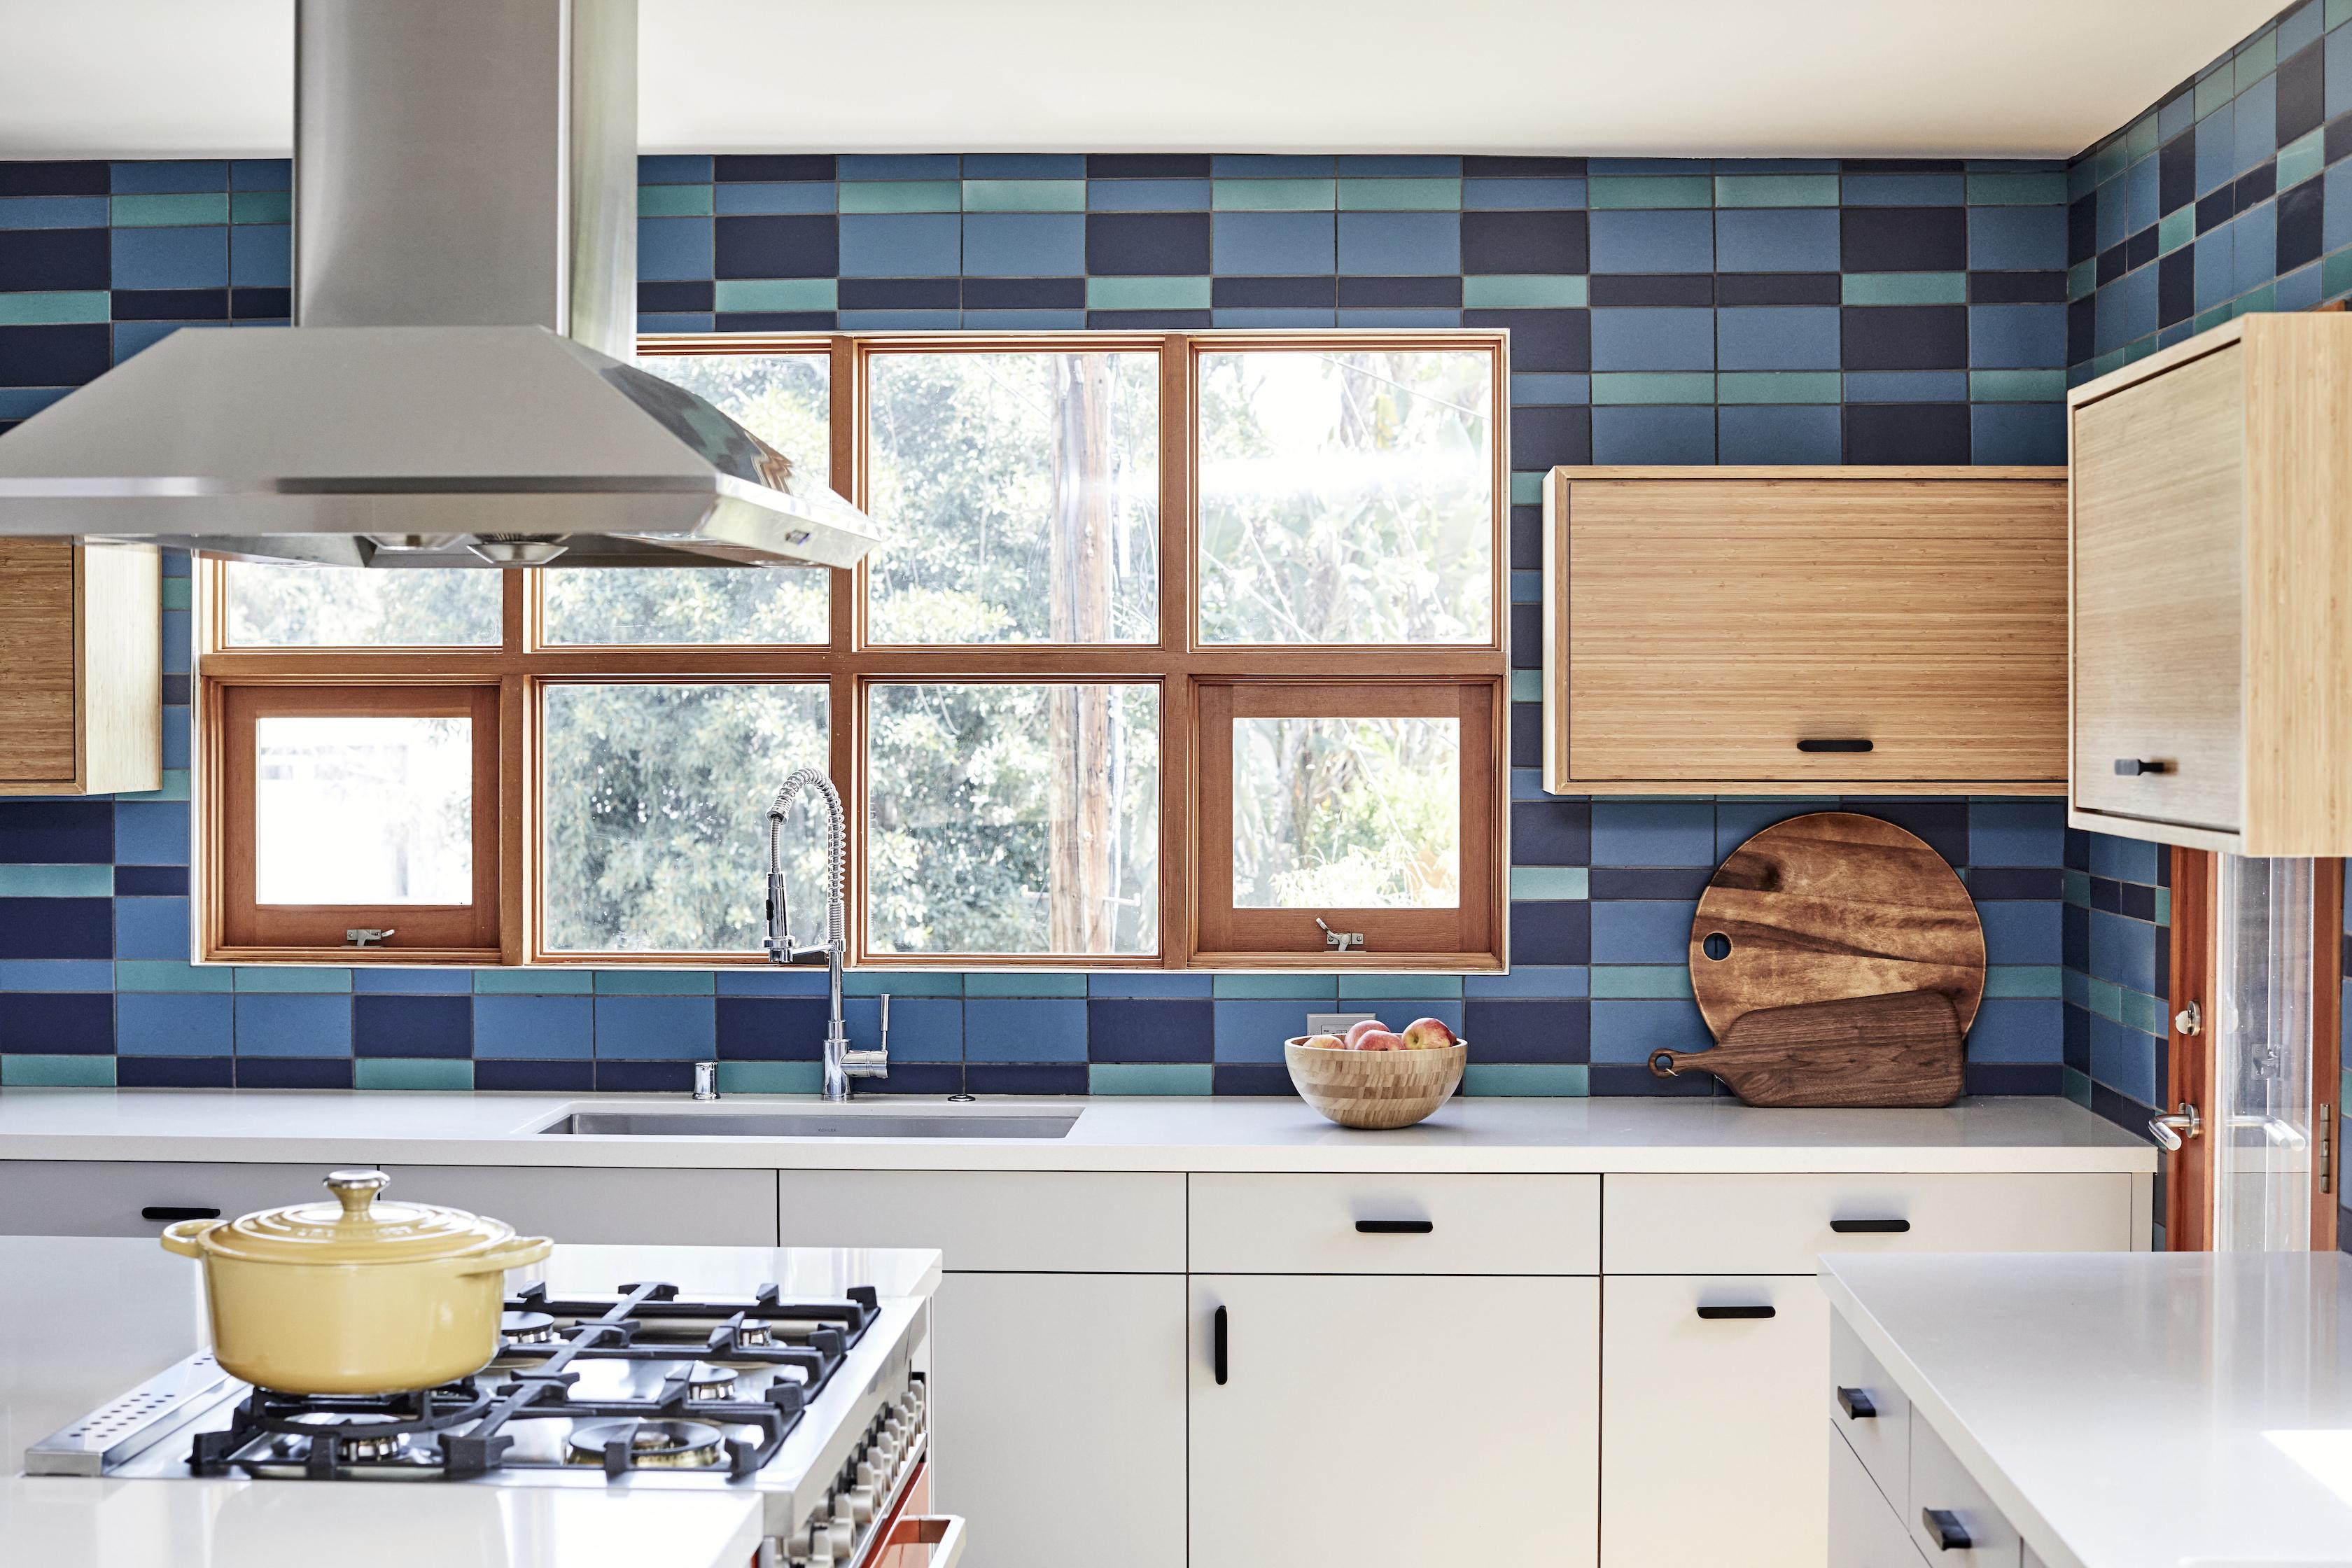 2017_q4_img_hi_res_rights_residential_the_niche_home_jenna_Peffley_photo_ceramic_kitchen_backsplash_plaid_peacock_2x8_4x8_fluorite_2x8_4x8_blue_velvet_2x8_4x8_blend_FC207276_3_181029_153441.jpg?mtime=20181029153441#asset:423583